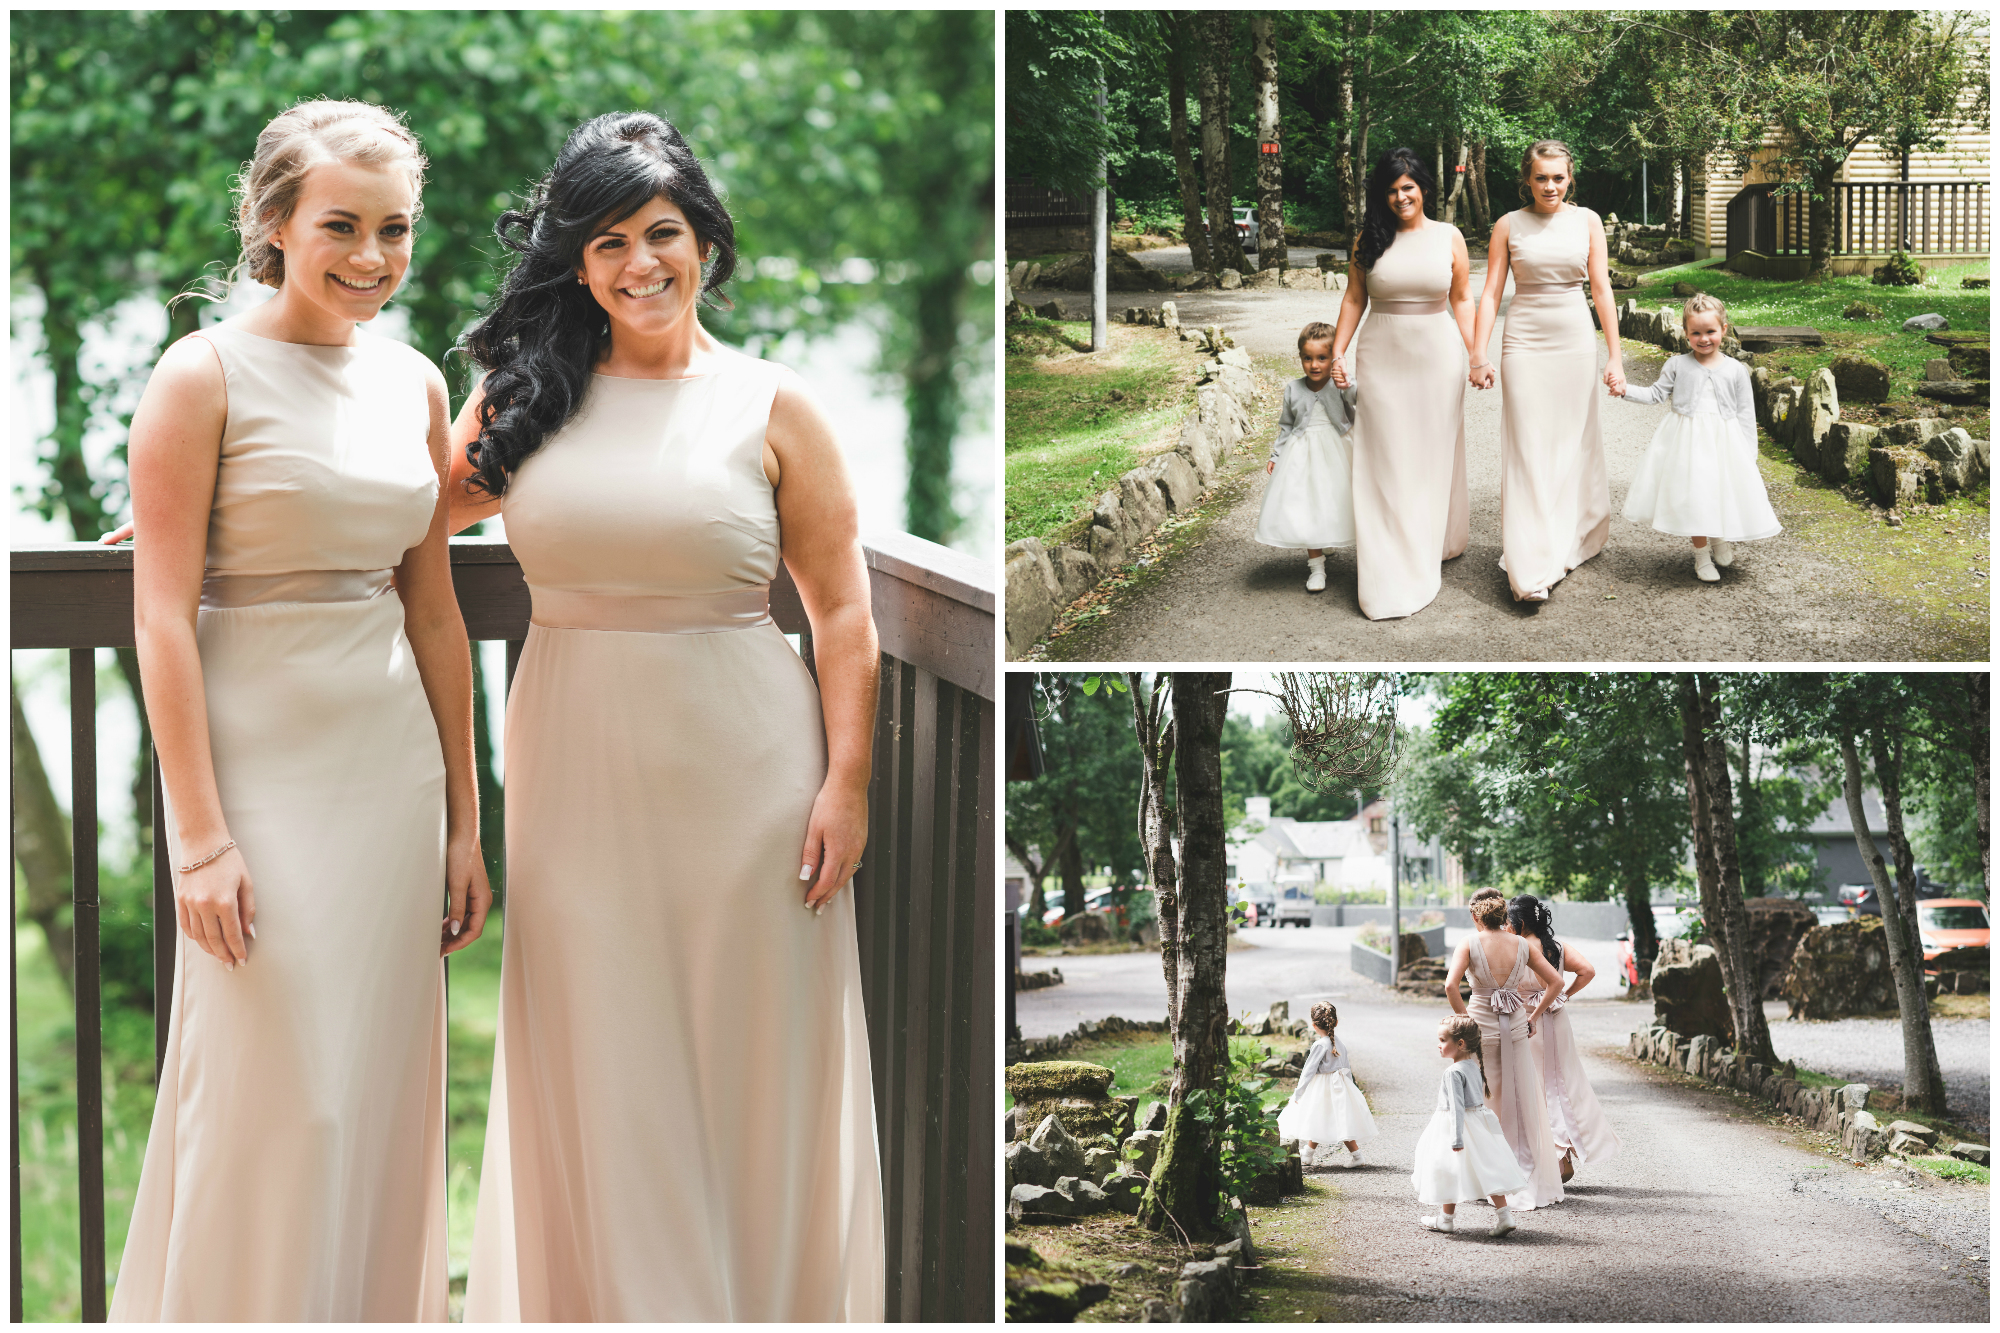 Lusty Beg Island Wedding Photographer Pure Photo N.I Bridesmaids ready